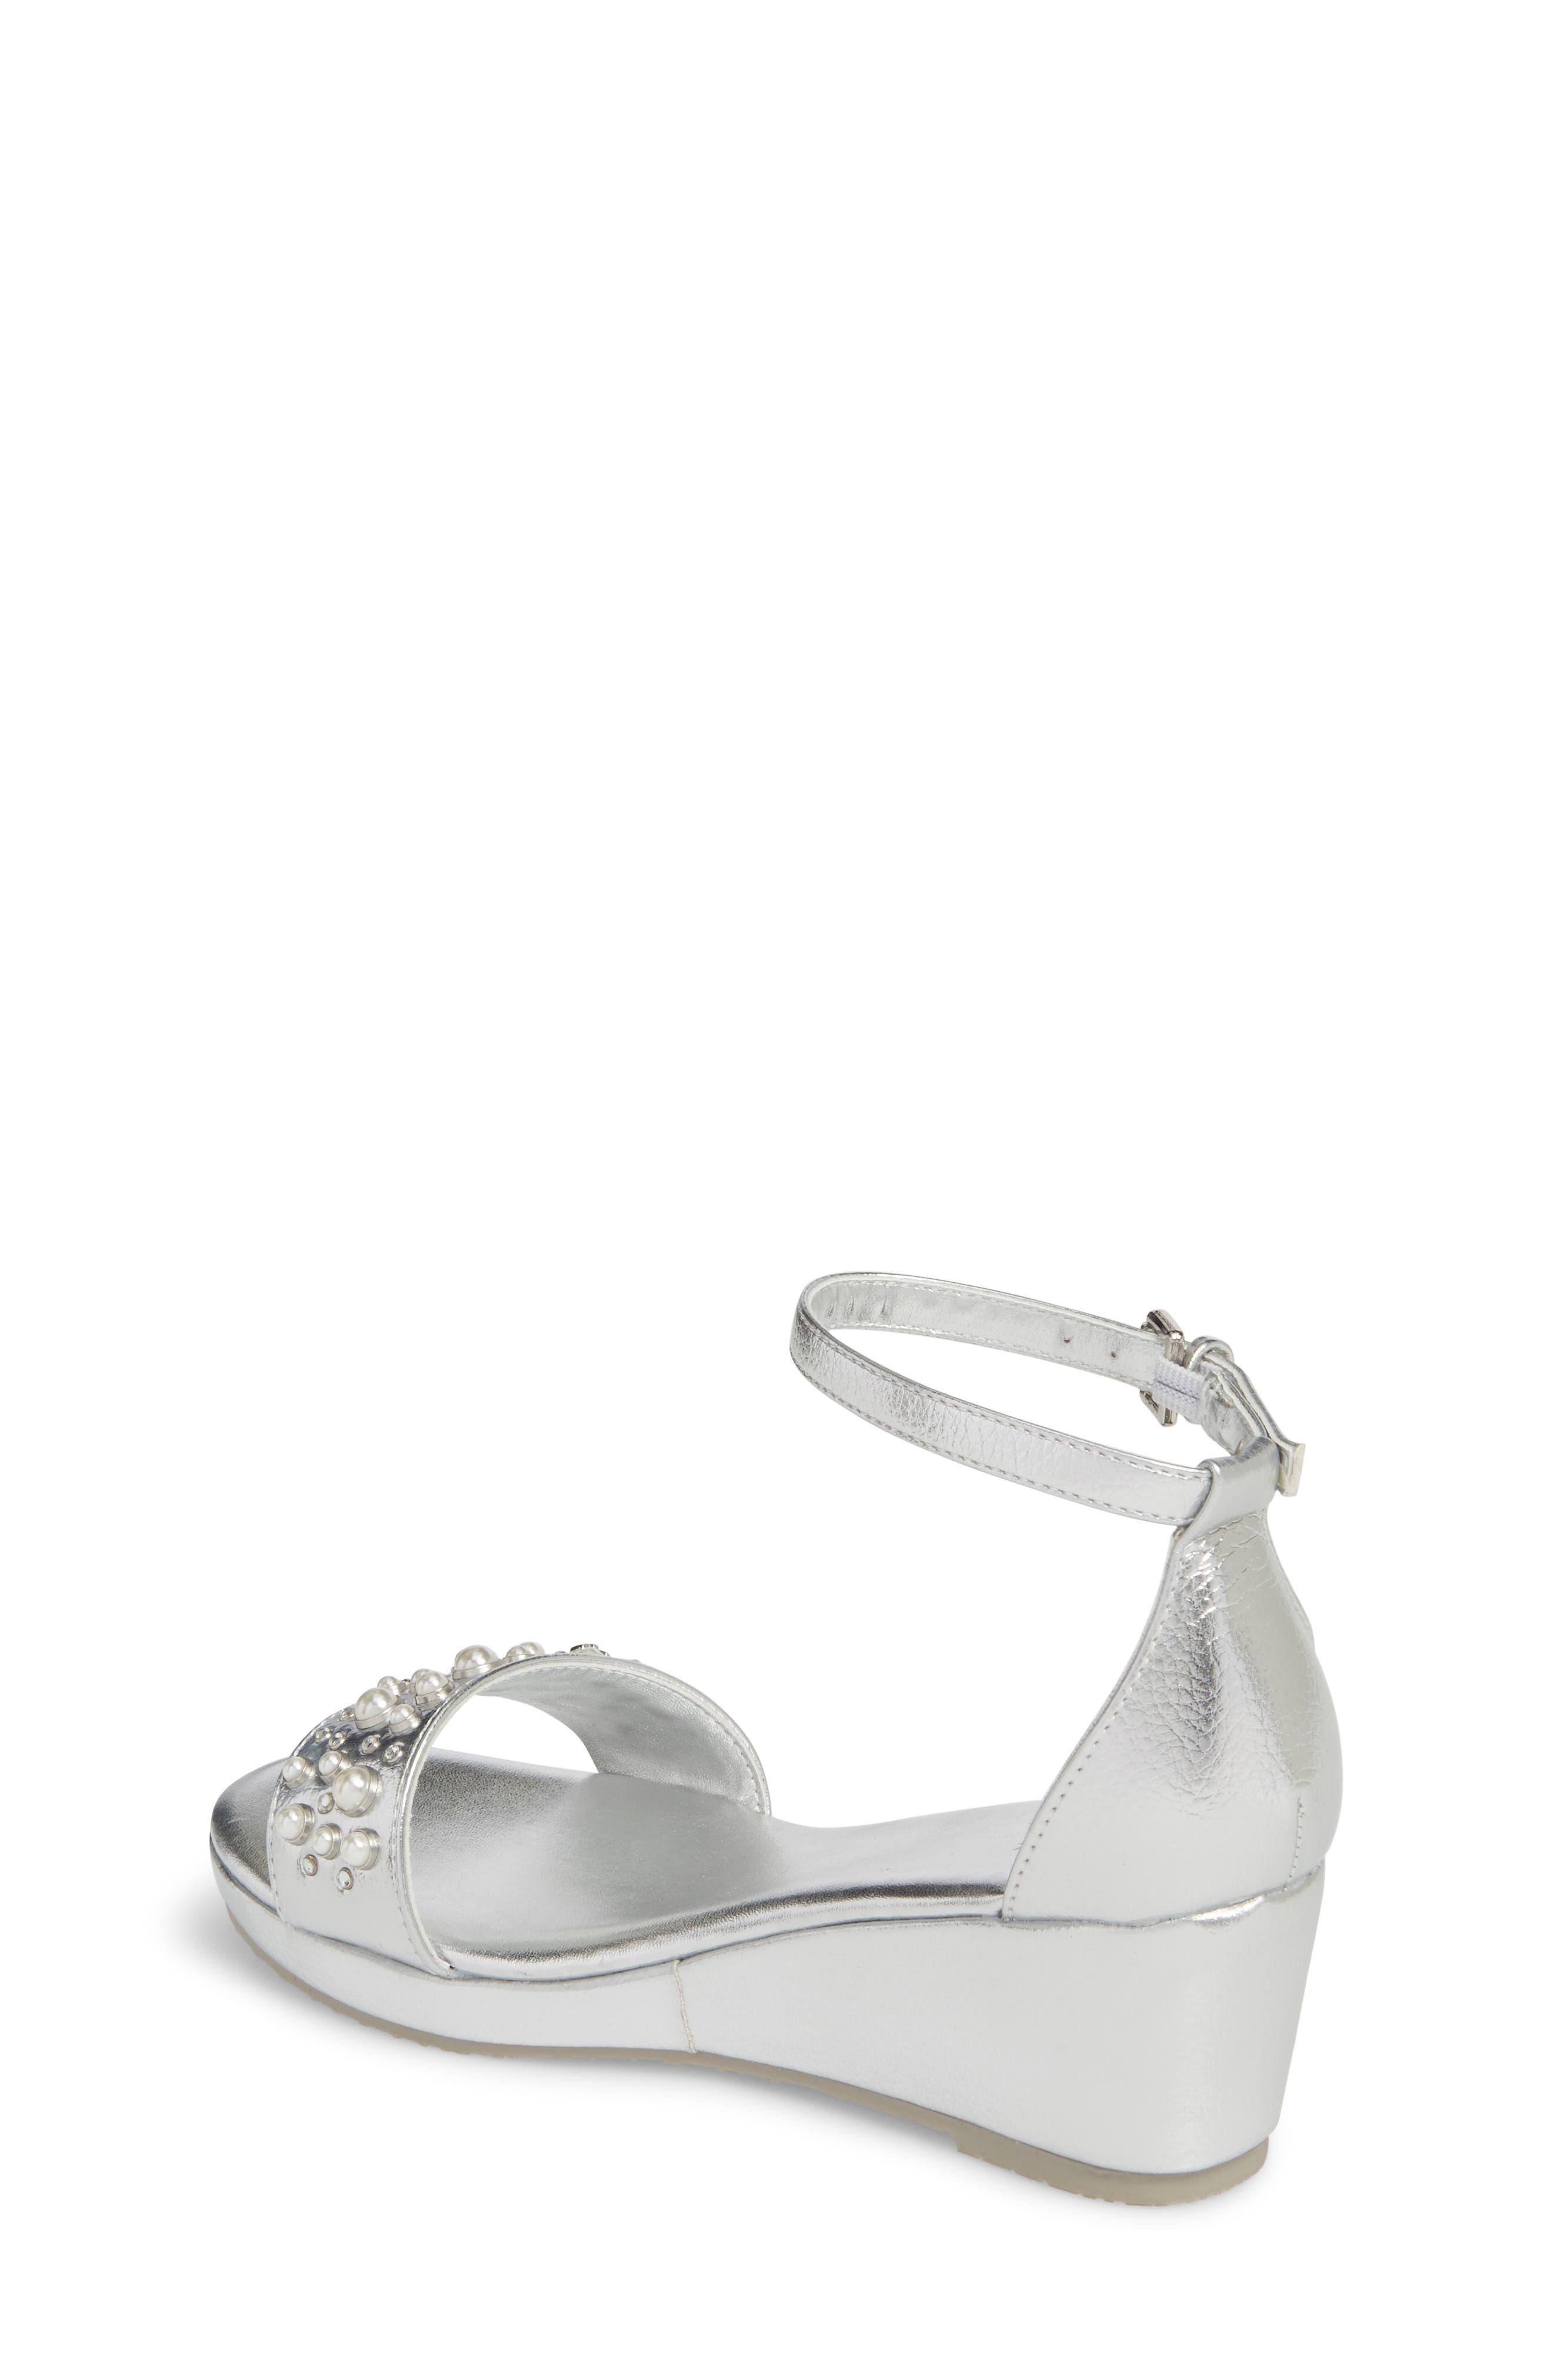 Cate Embellished Wedge Sandal,                             Alternate thumbnail 2, color,                             Silver